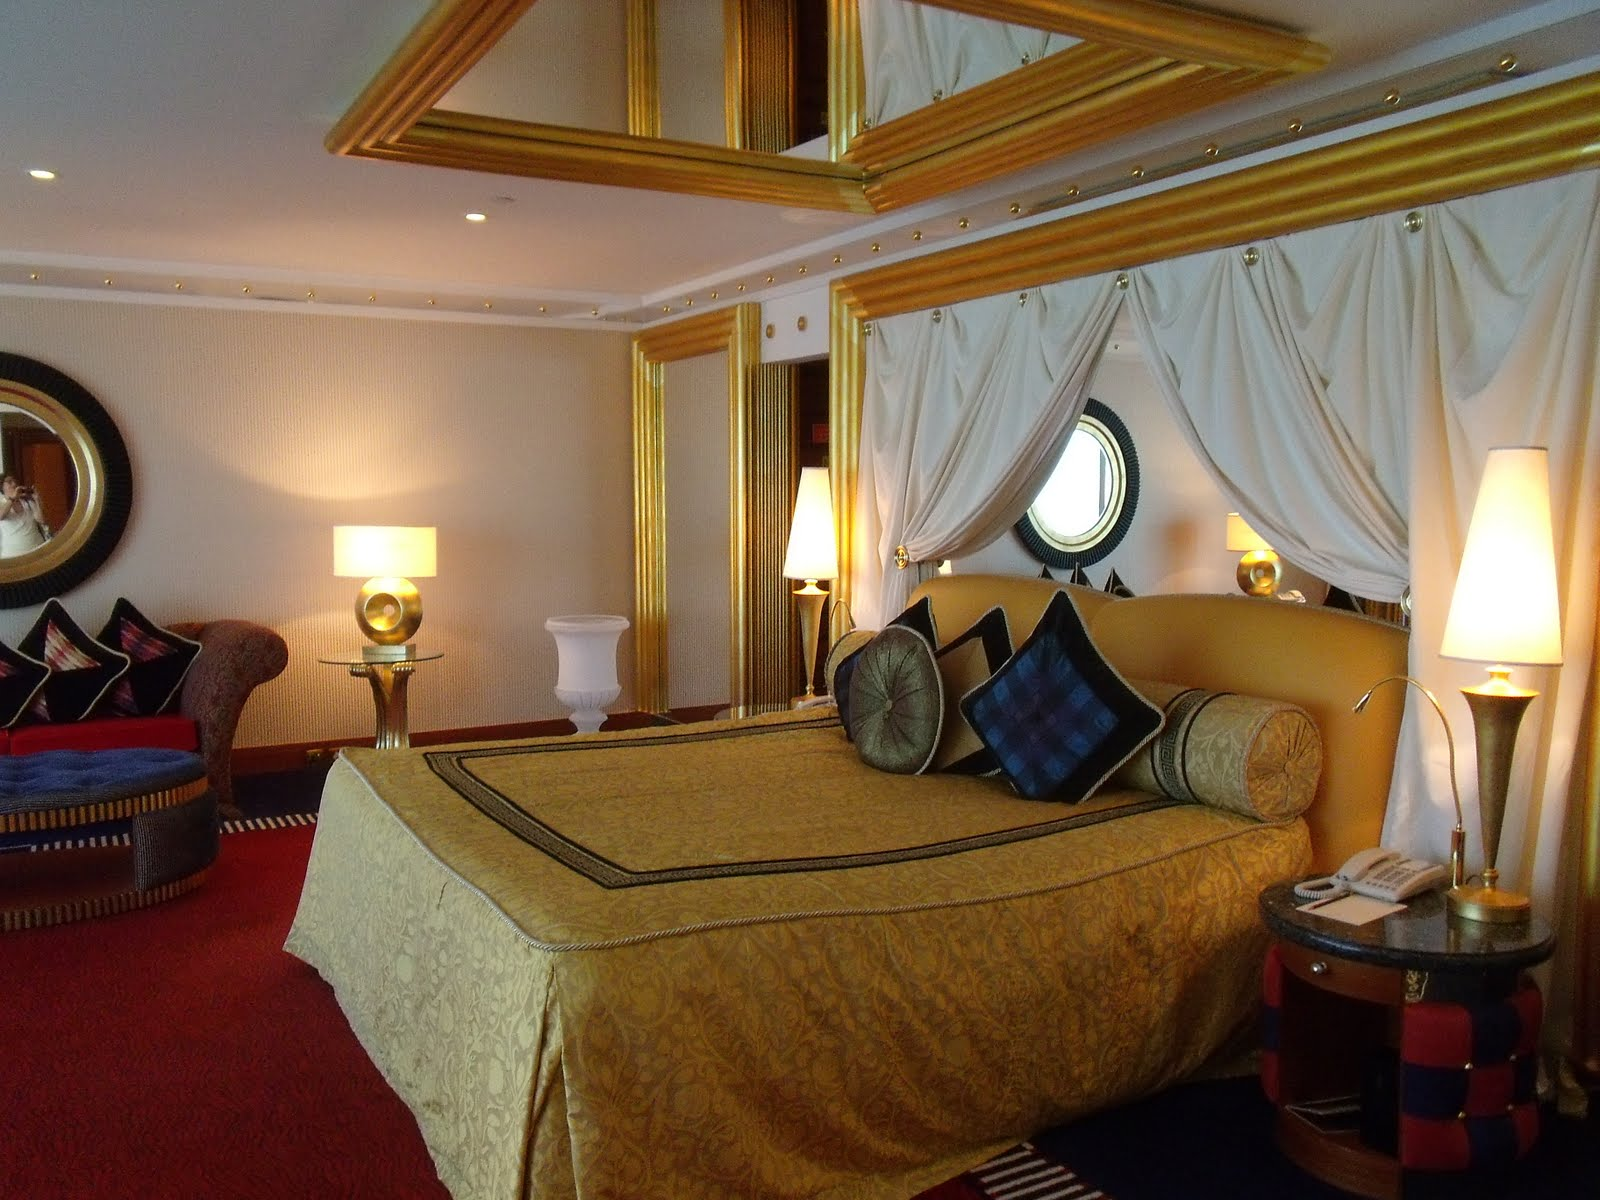 tamsin cooke burj al arab 2 bedroom master suite